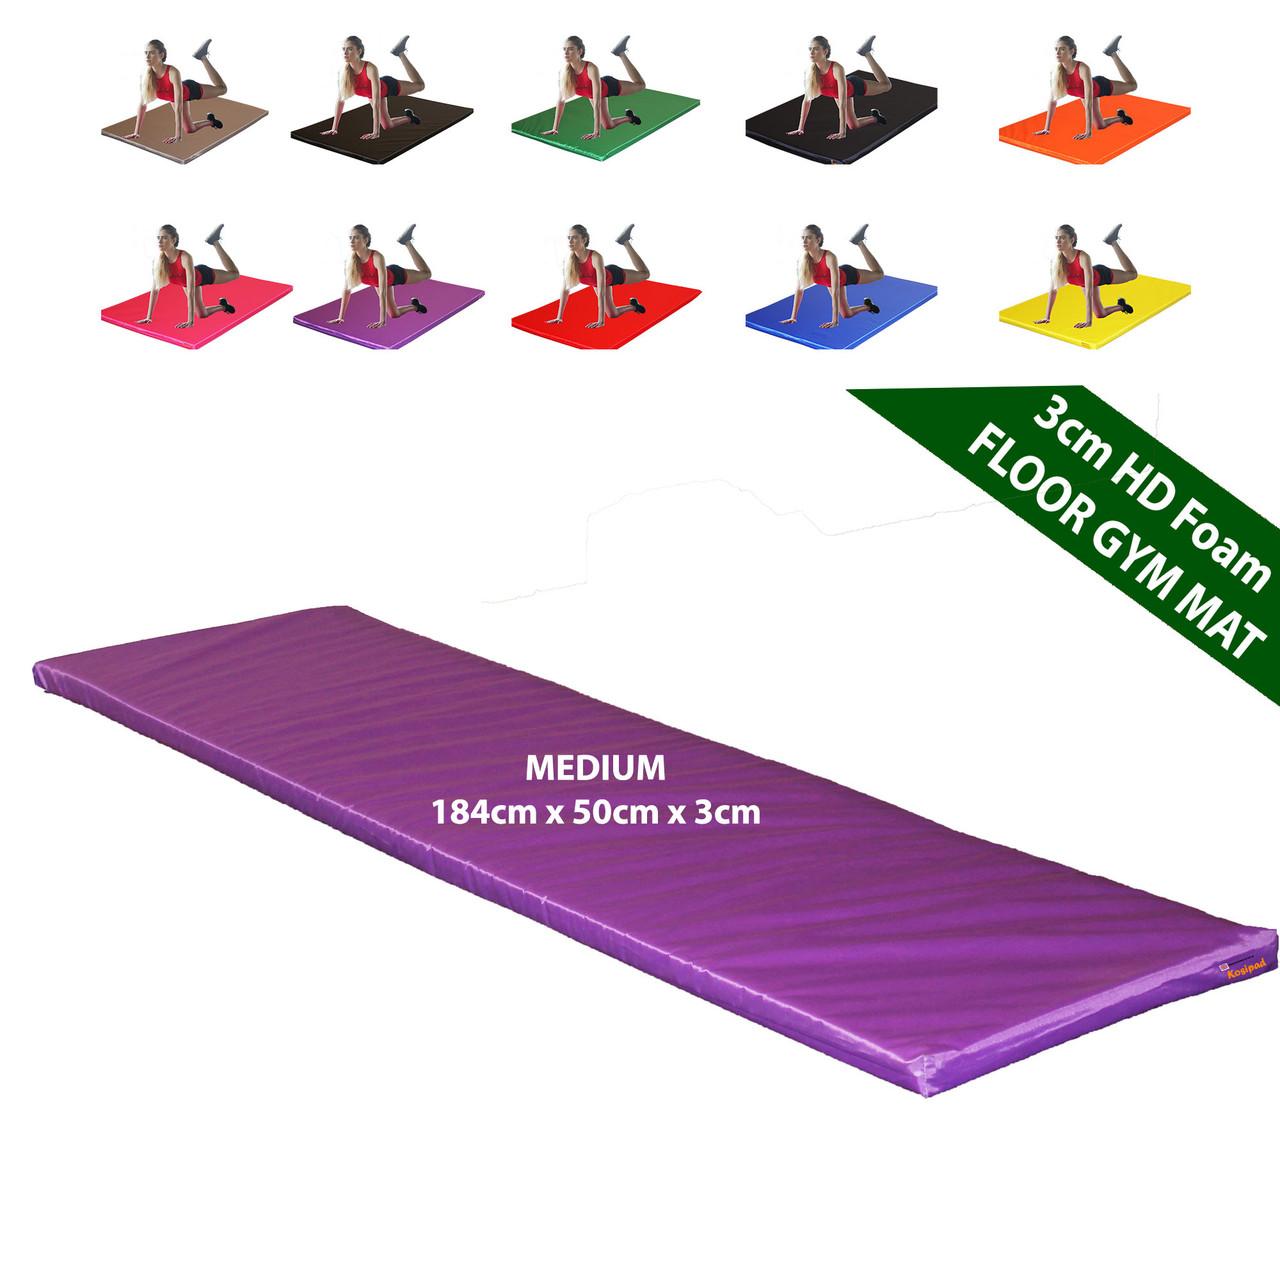 Kosipad 3cm Thick foam floor gym crash mats Purple Medium